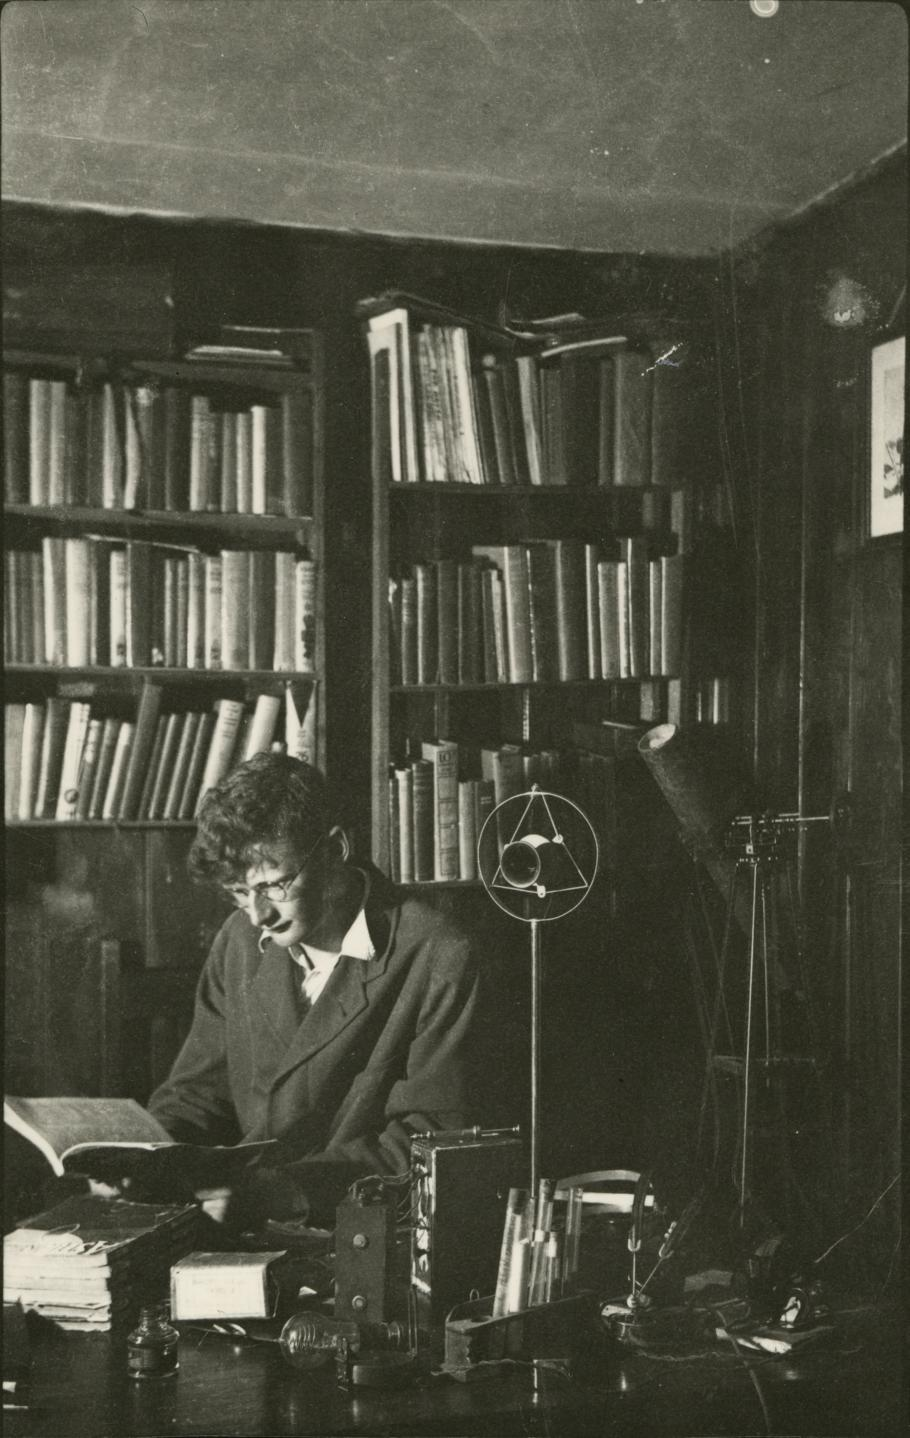 Arthur C. Clarke in his Study